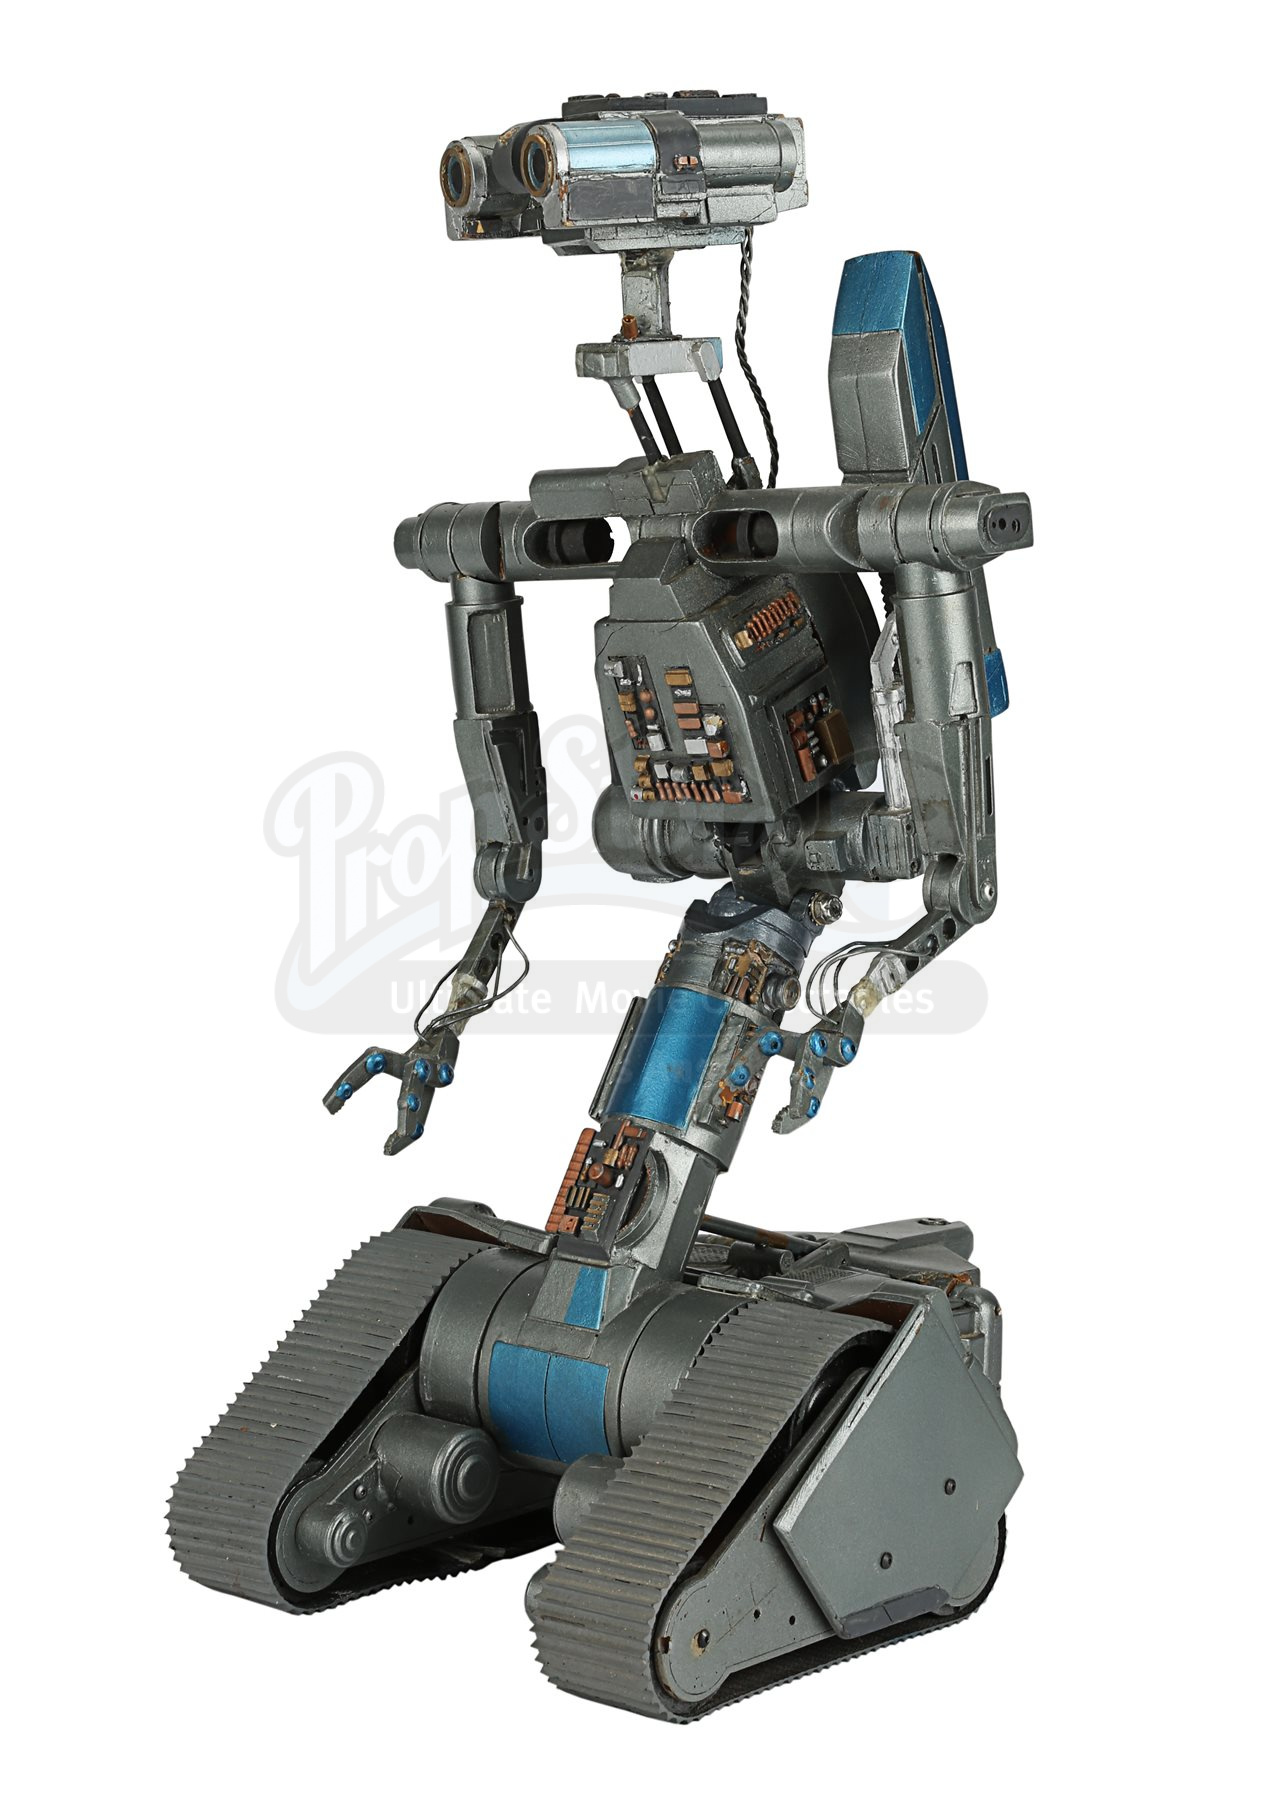 Short Circuit 2 1988 Miniature Johnny 5 Robot Model Current For Sale Lot 398 M